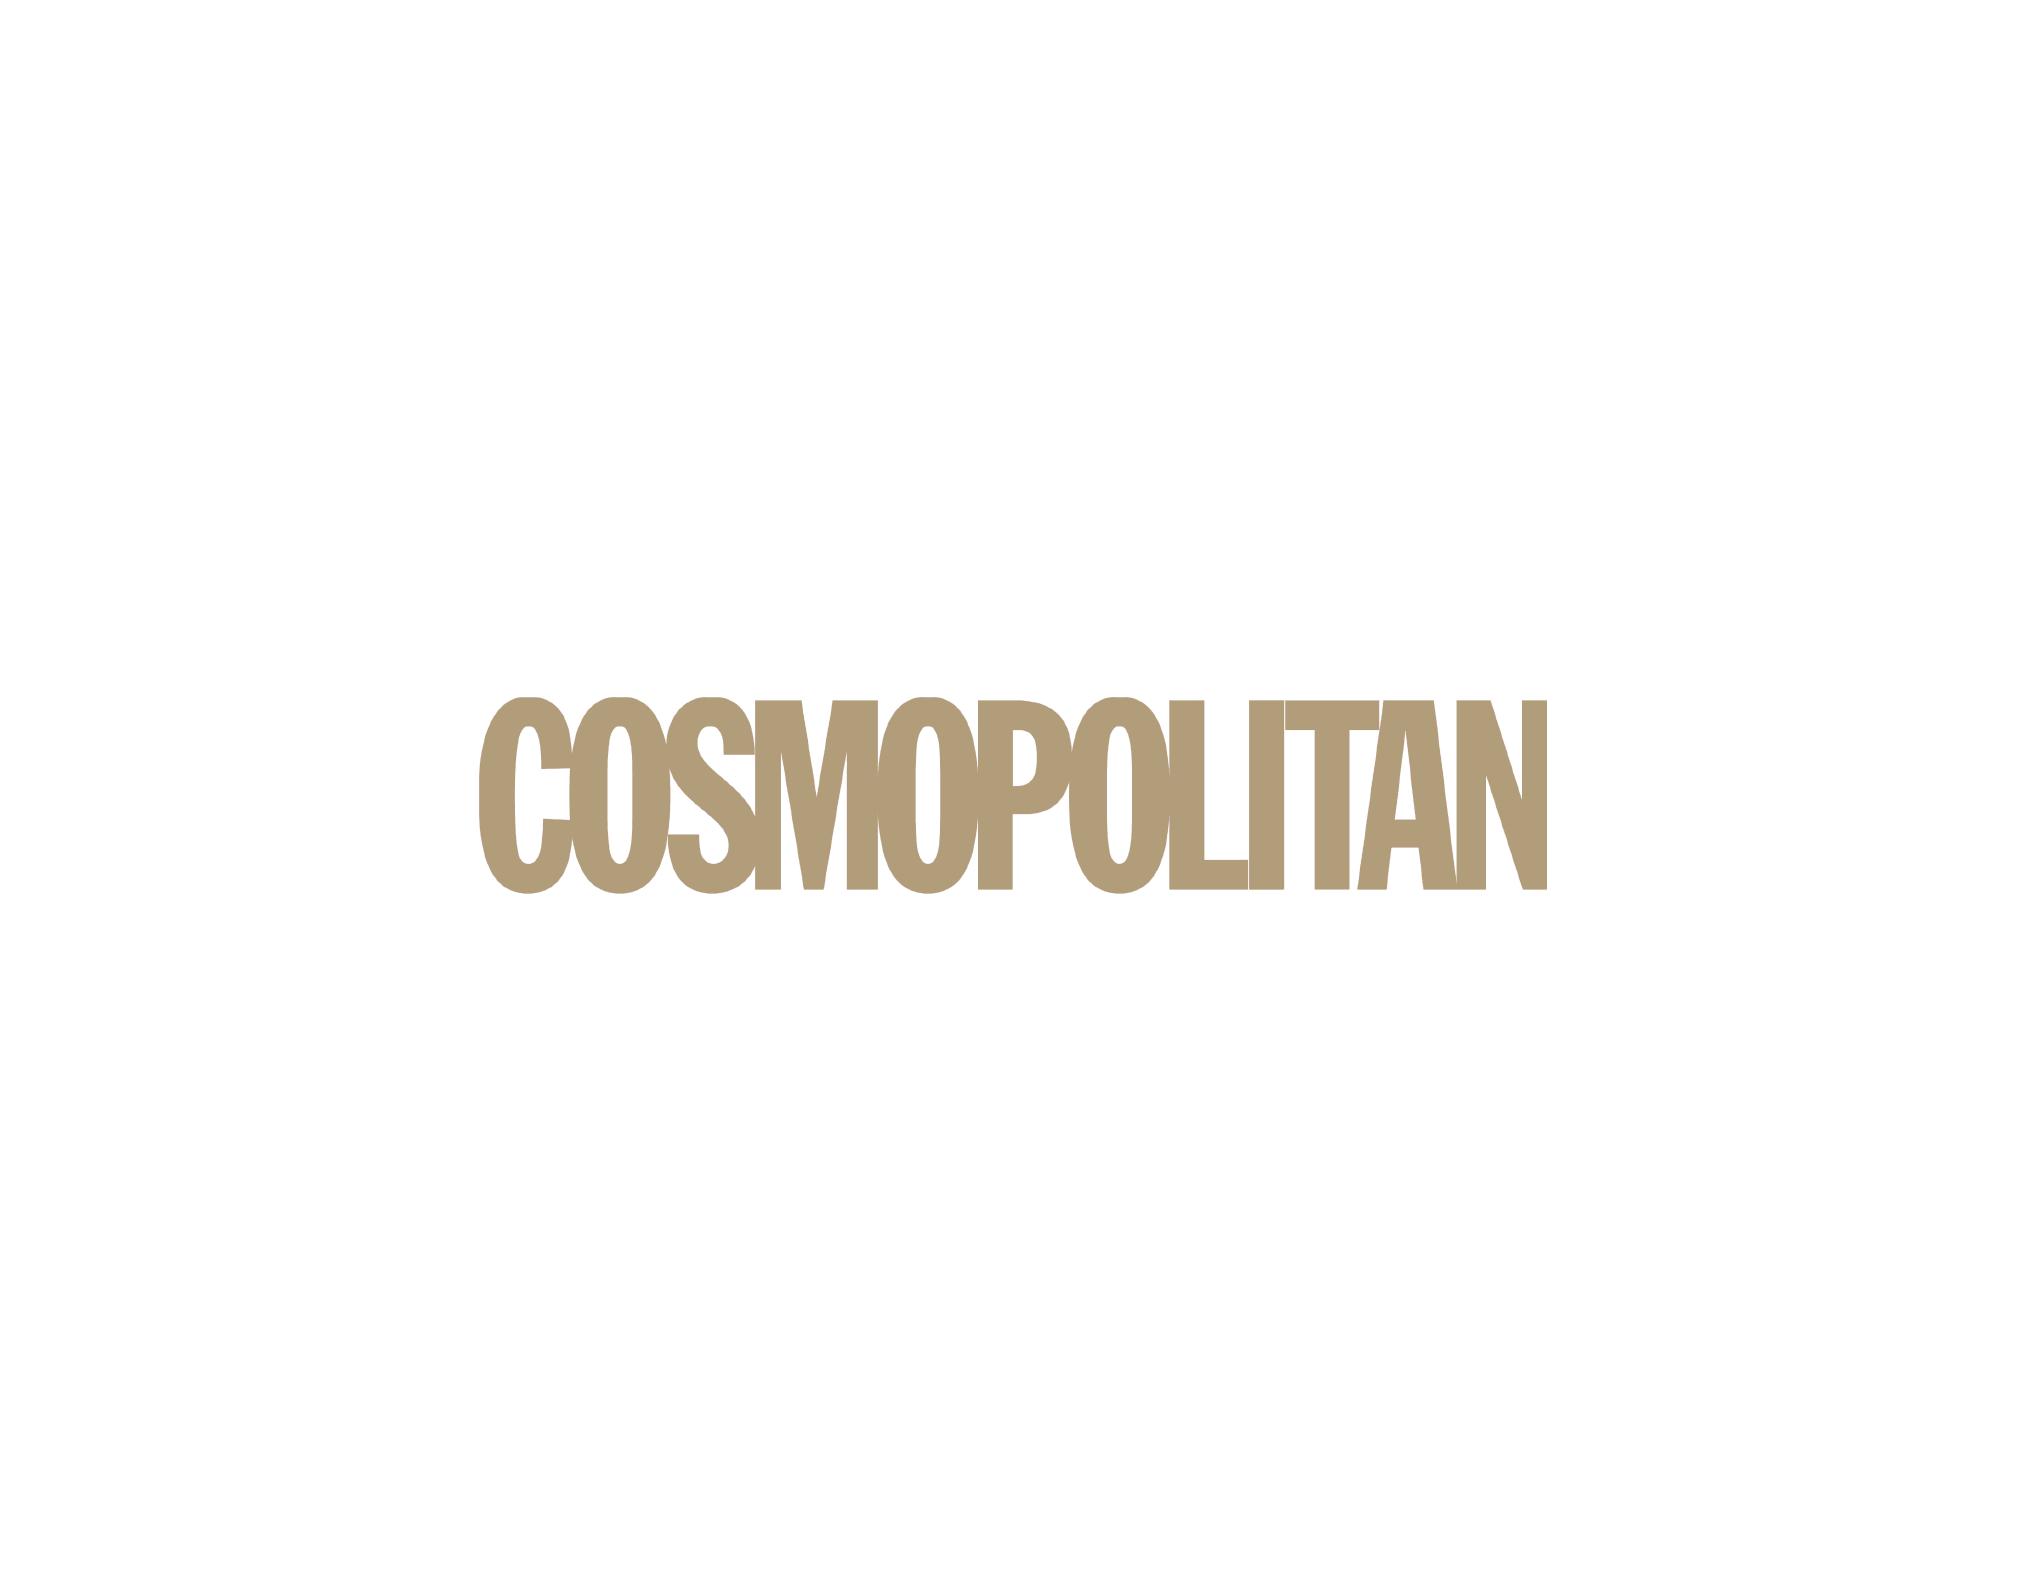 Press_Logo_Cosmopolitan_Cosmopolitan.png